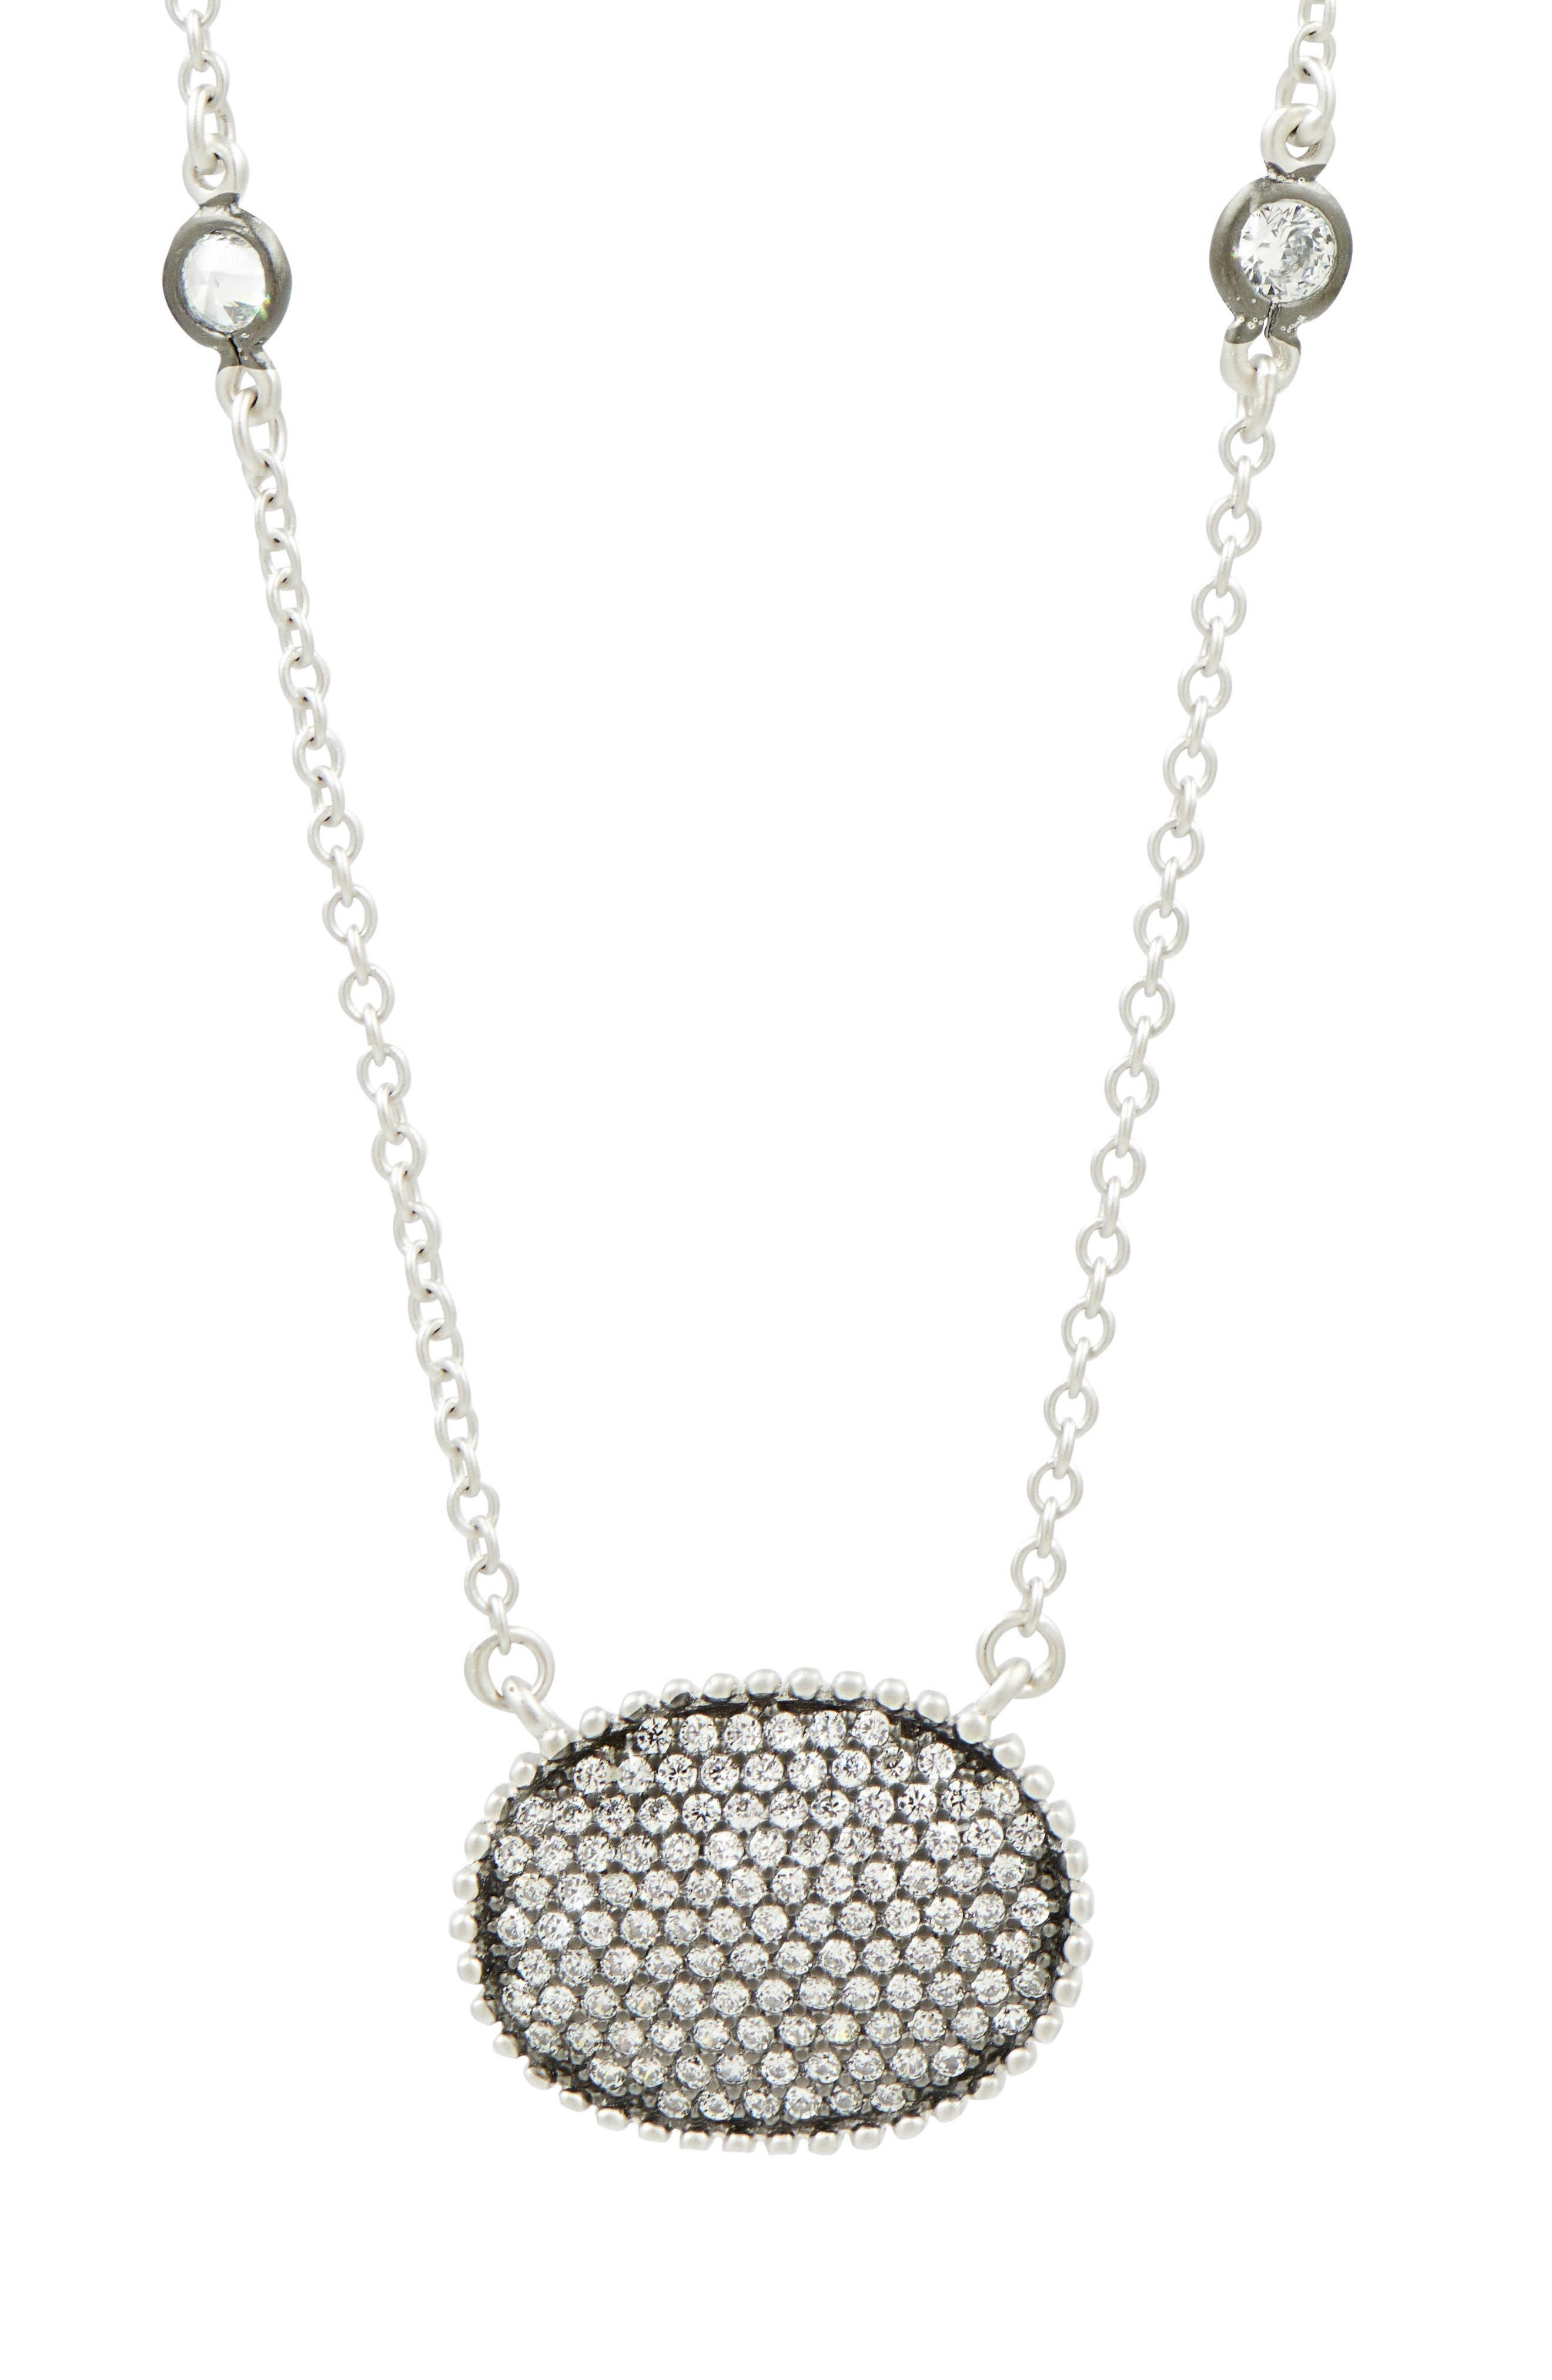 Oval Pendant Necklace,                             Main thumbnail 1, color,                             SILVER/ BLACK RHODIUM